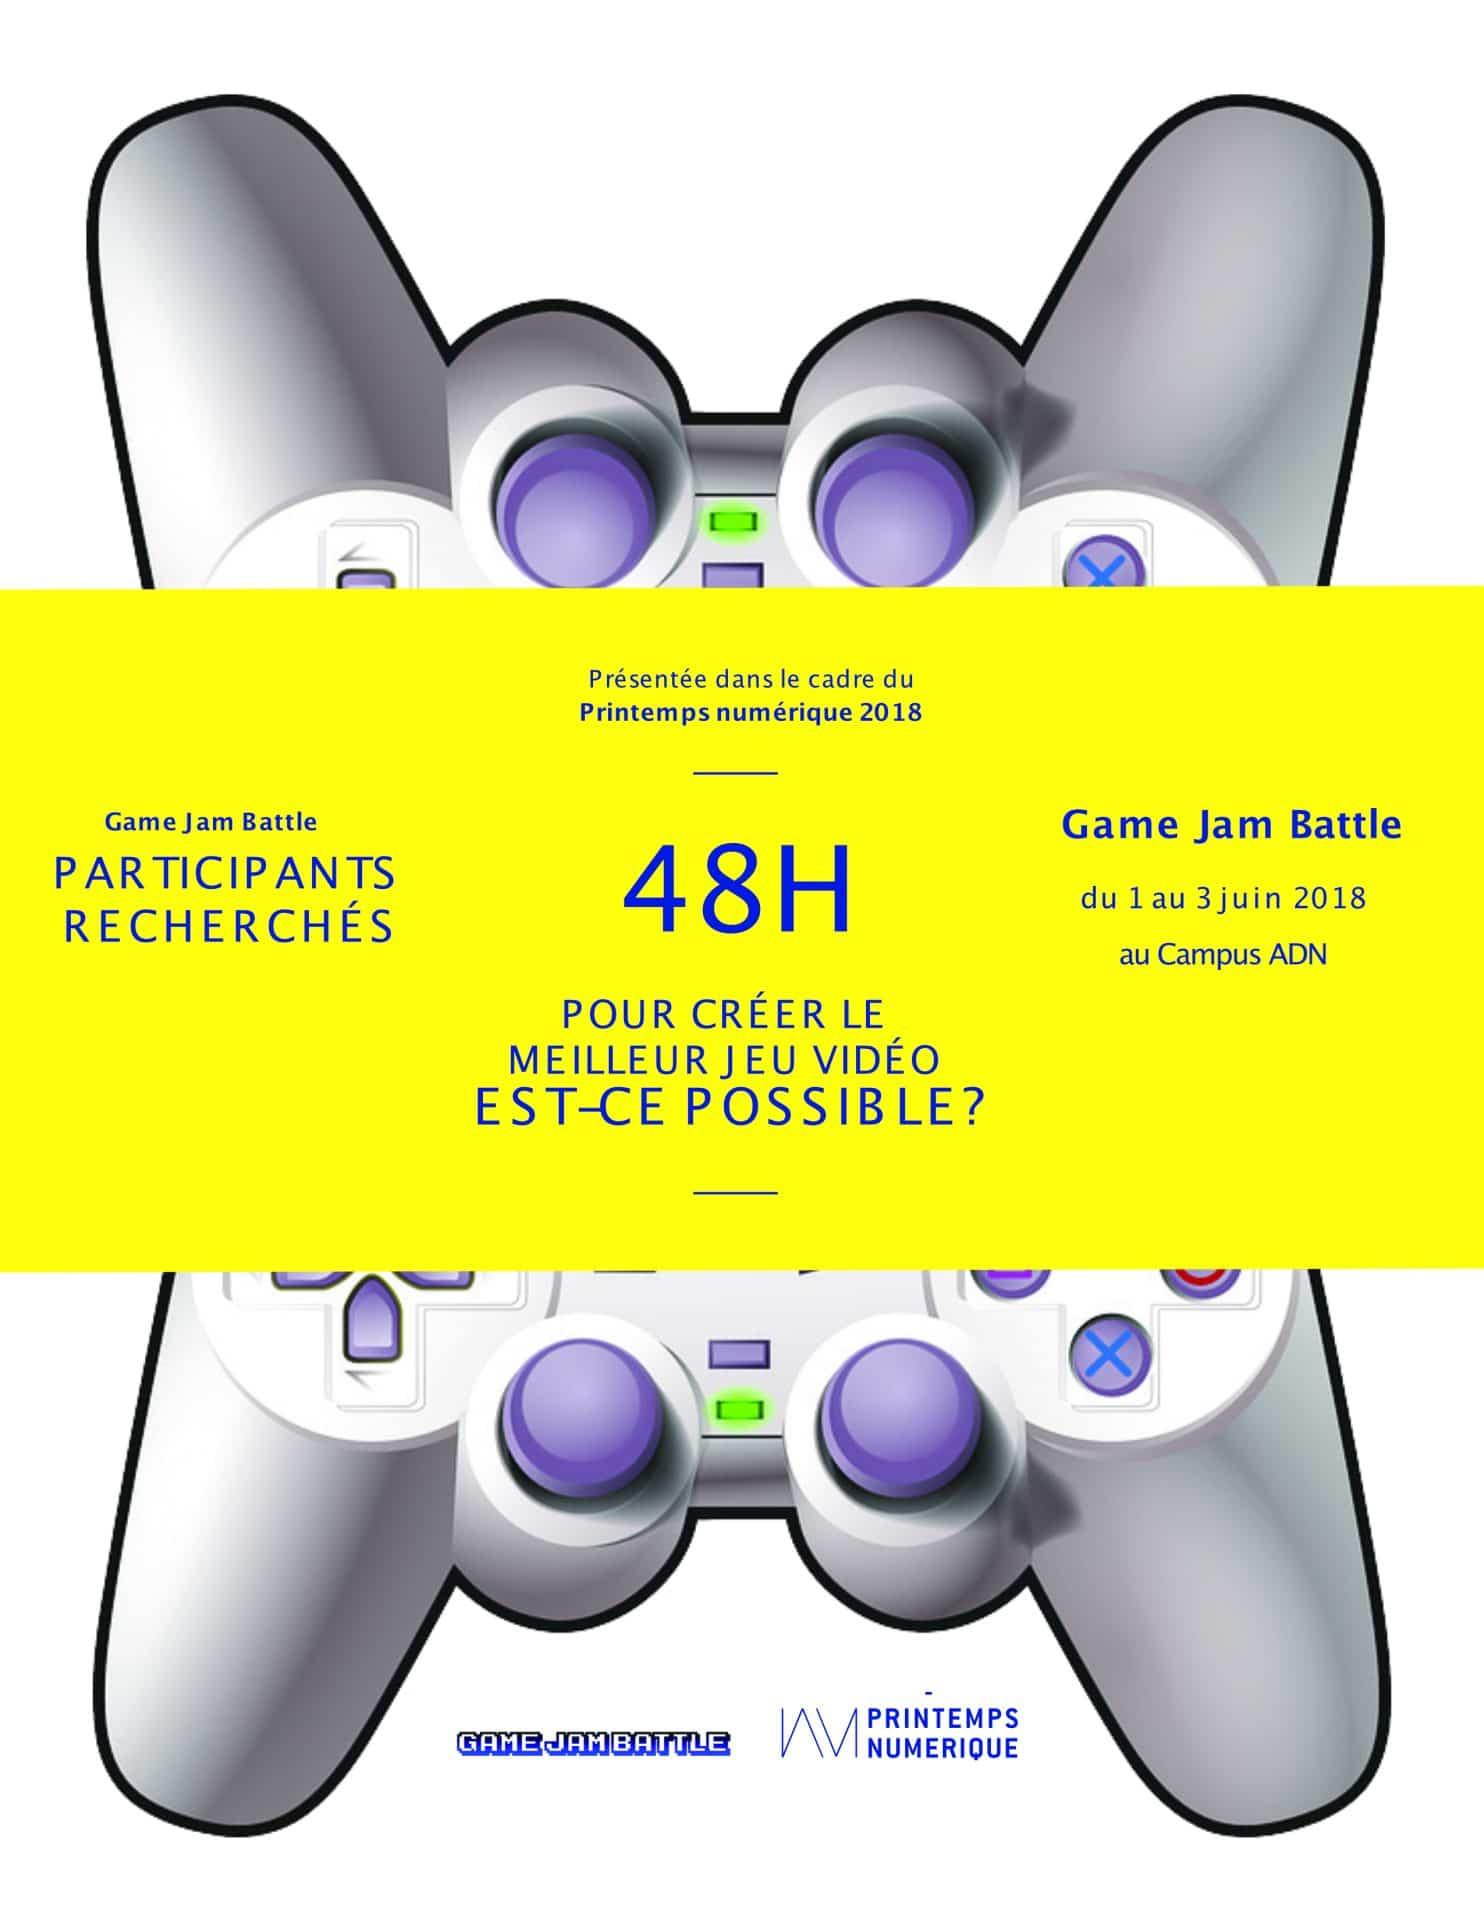 Game Jam Battle 2018